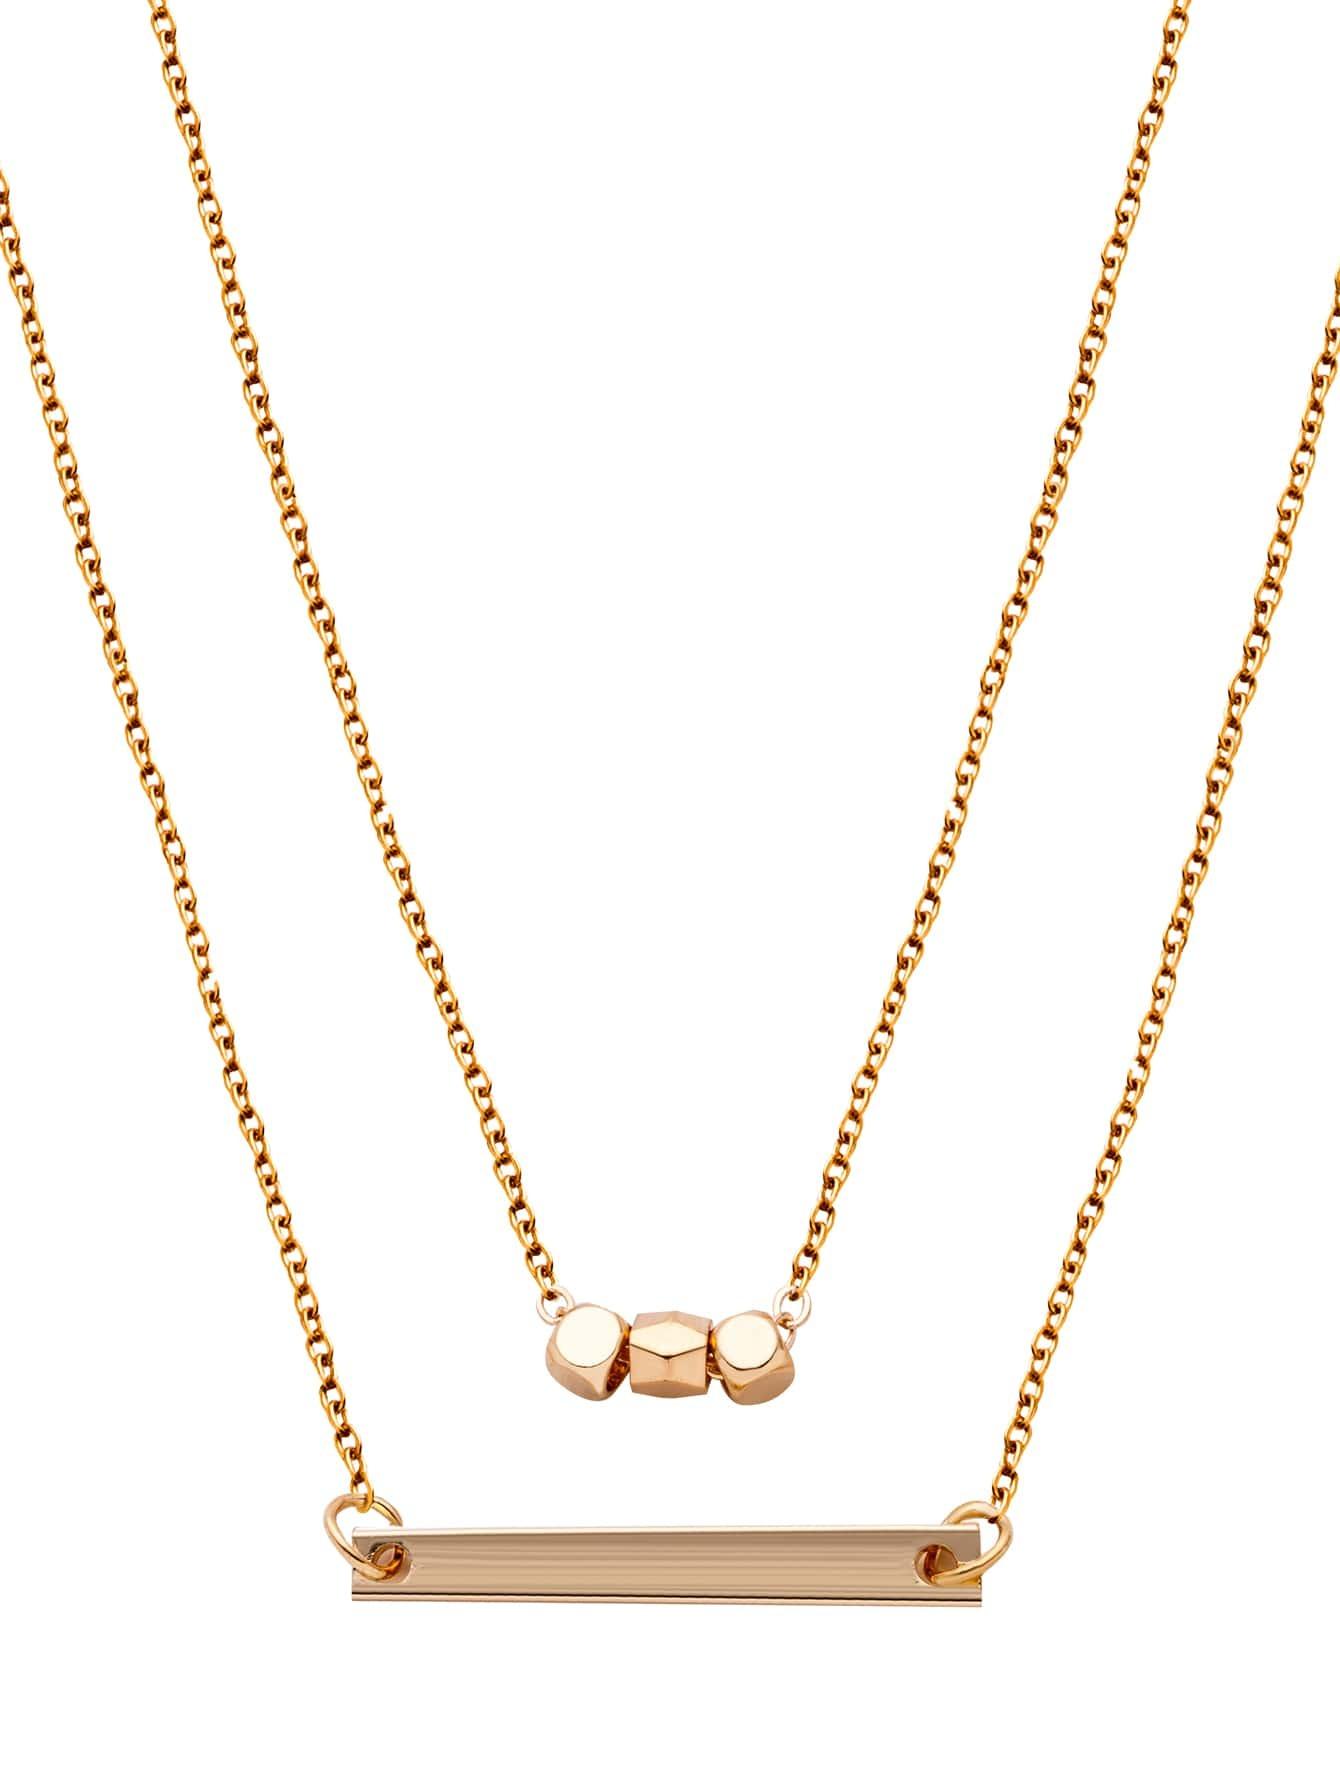 gold plated geometric horizontal bar pendant necklace. Black Bedroom Furniture Sets. Home Design Ideas